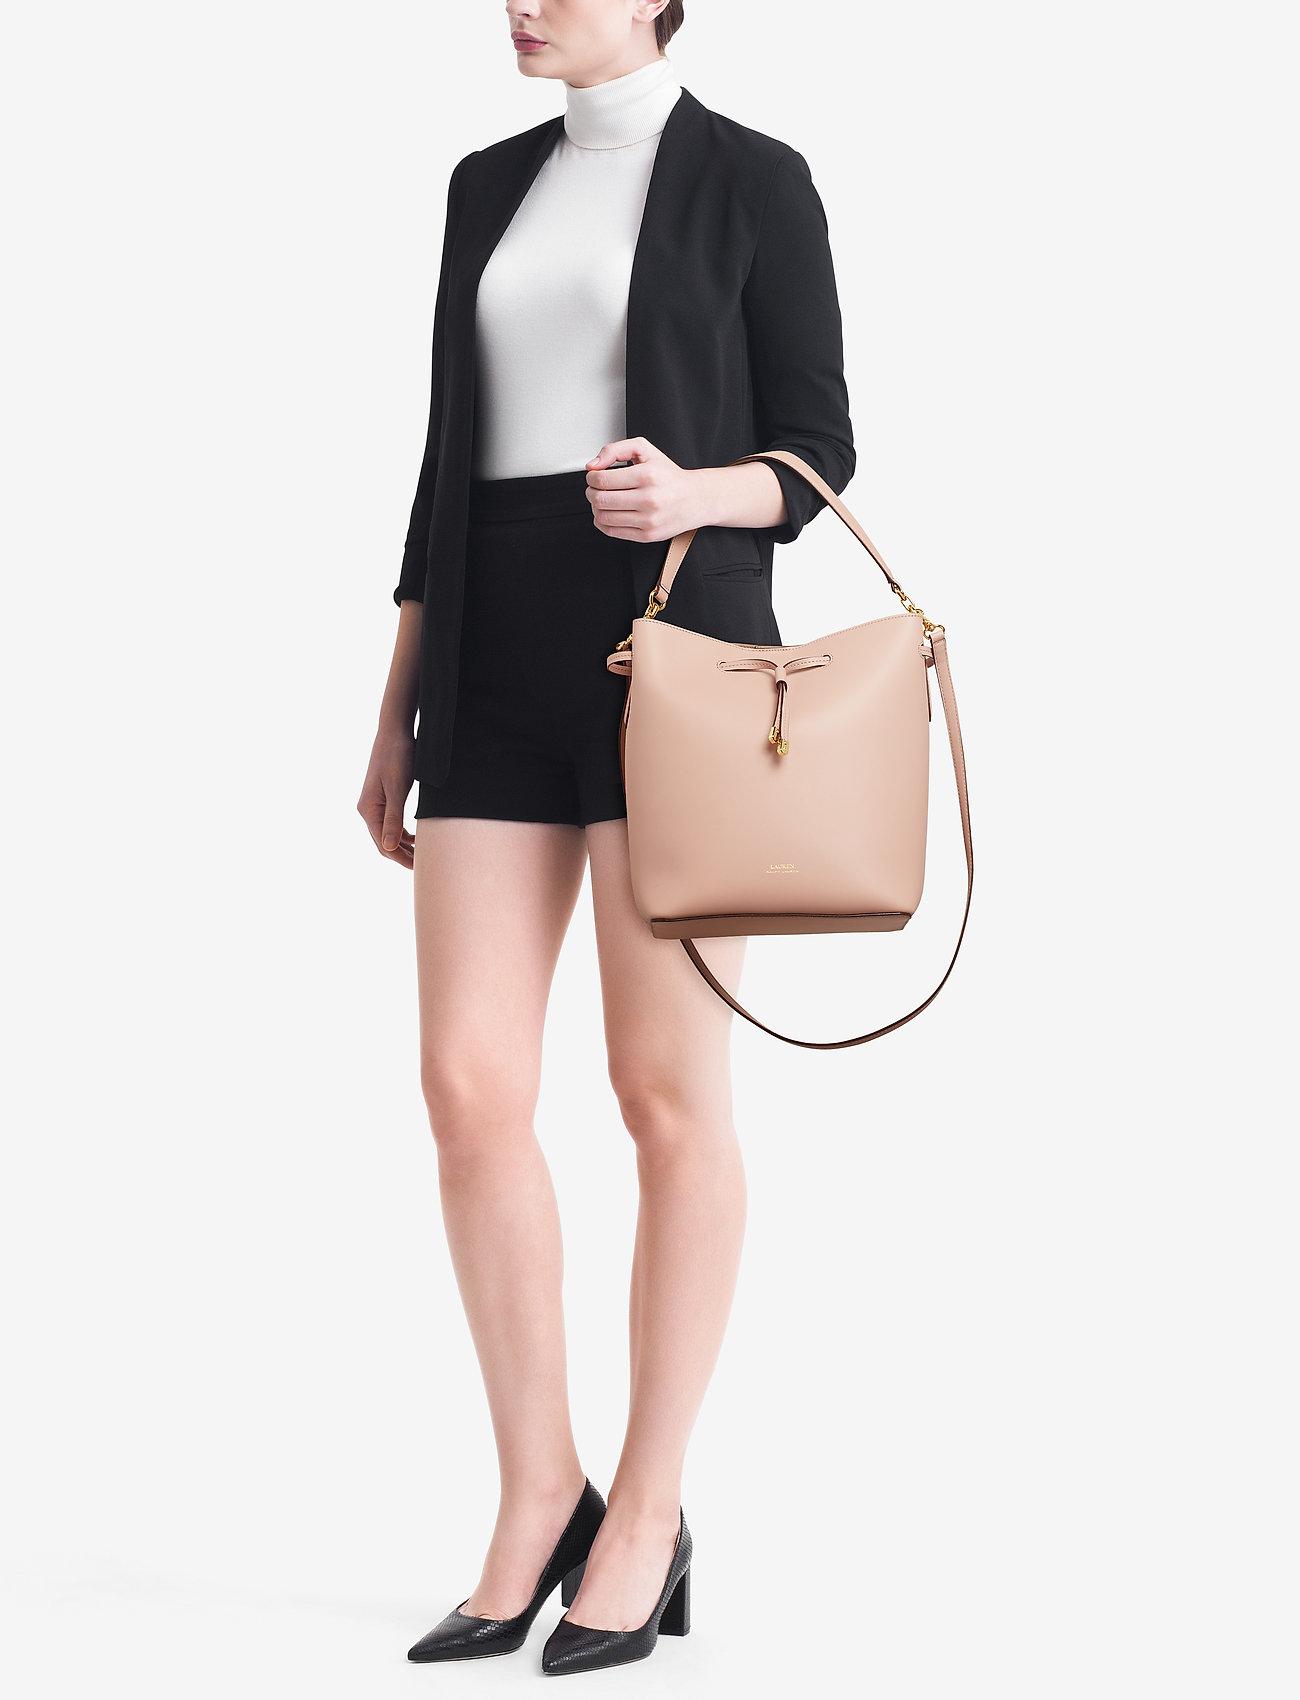 Lauren Ralph Lauren Leather Debby Drawstring Bag - MELLOW PINK/PORCI